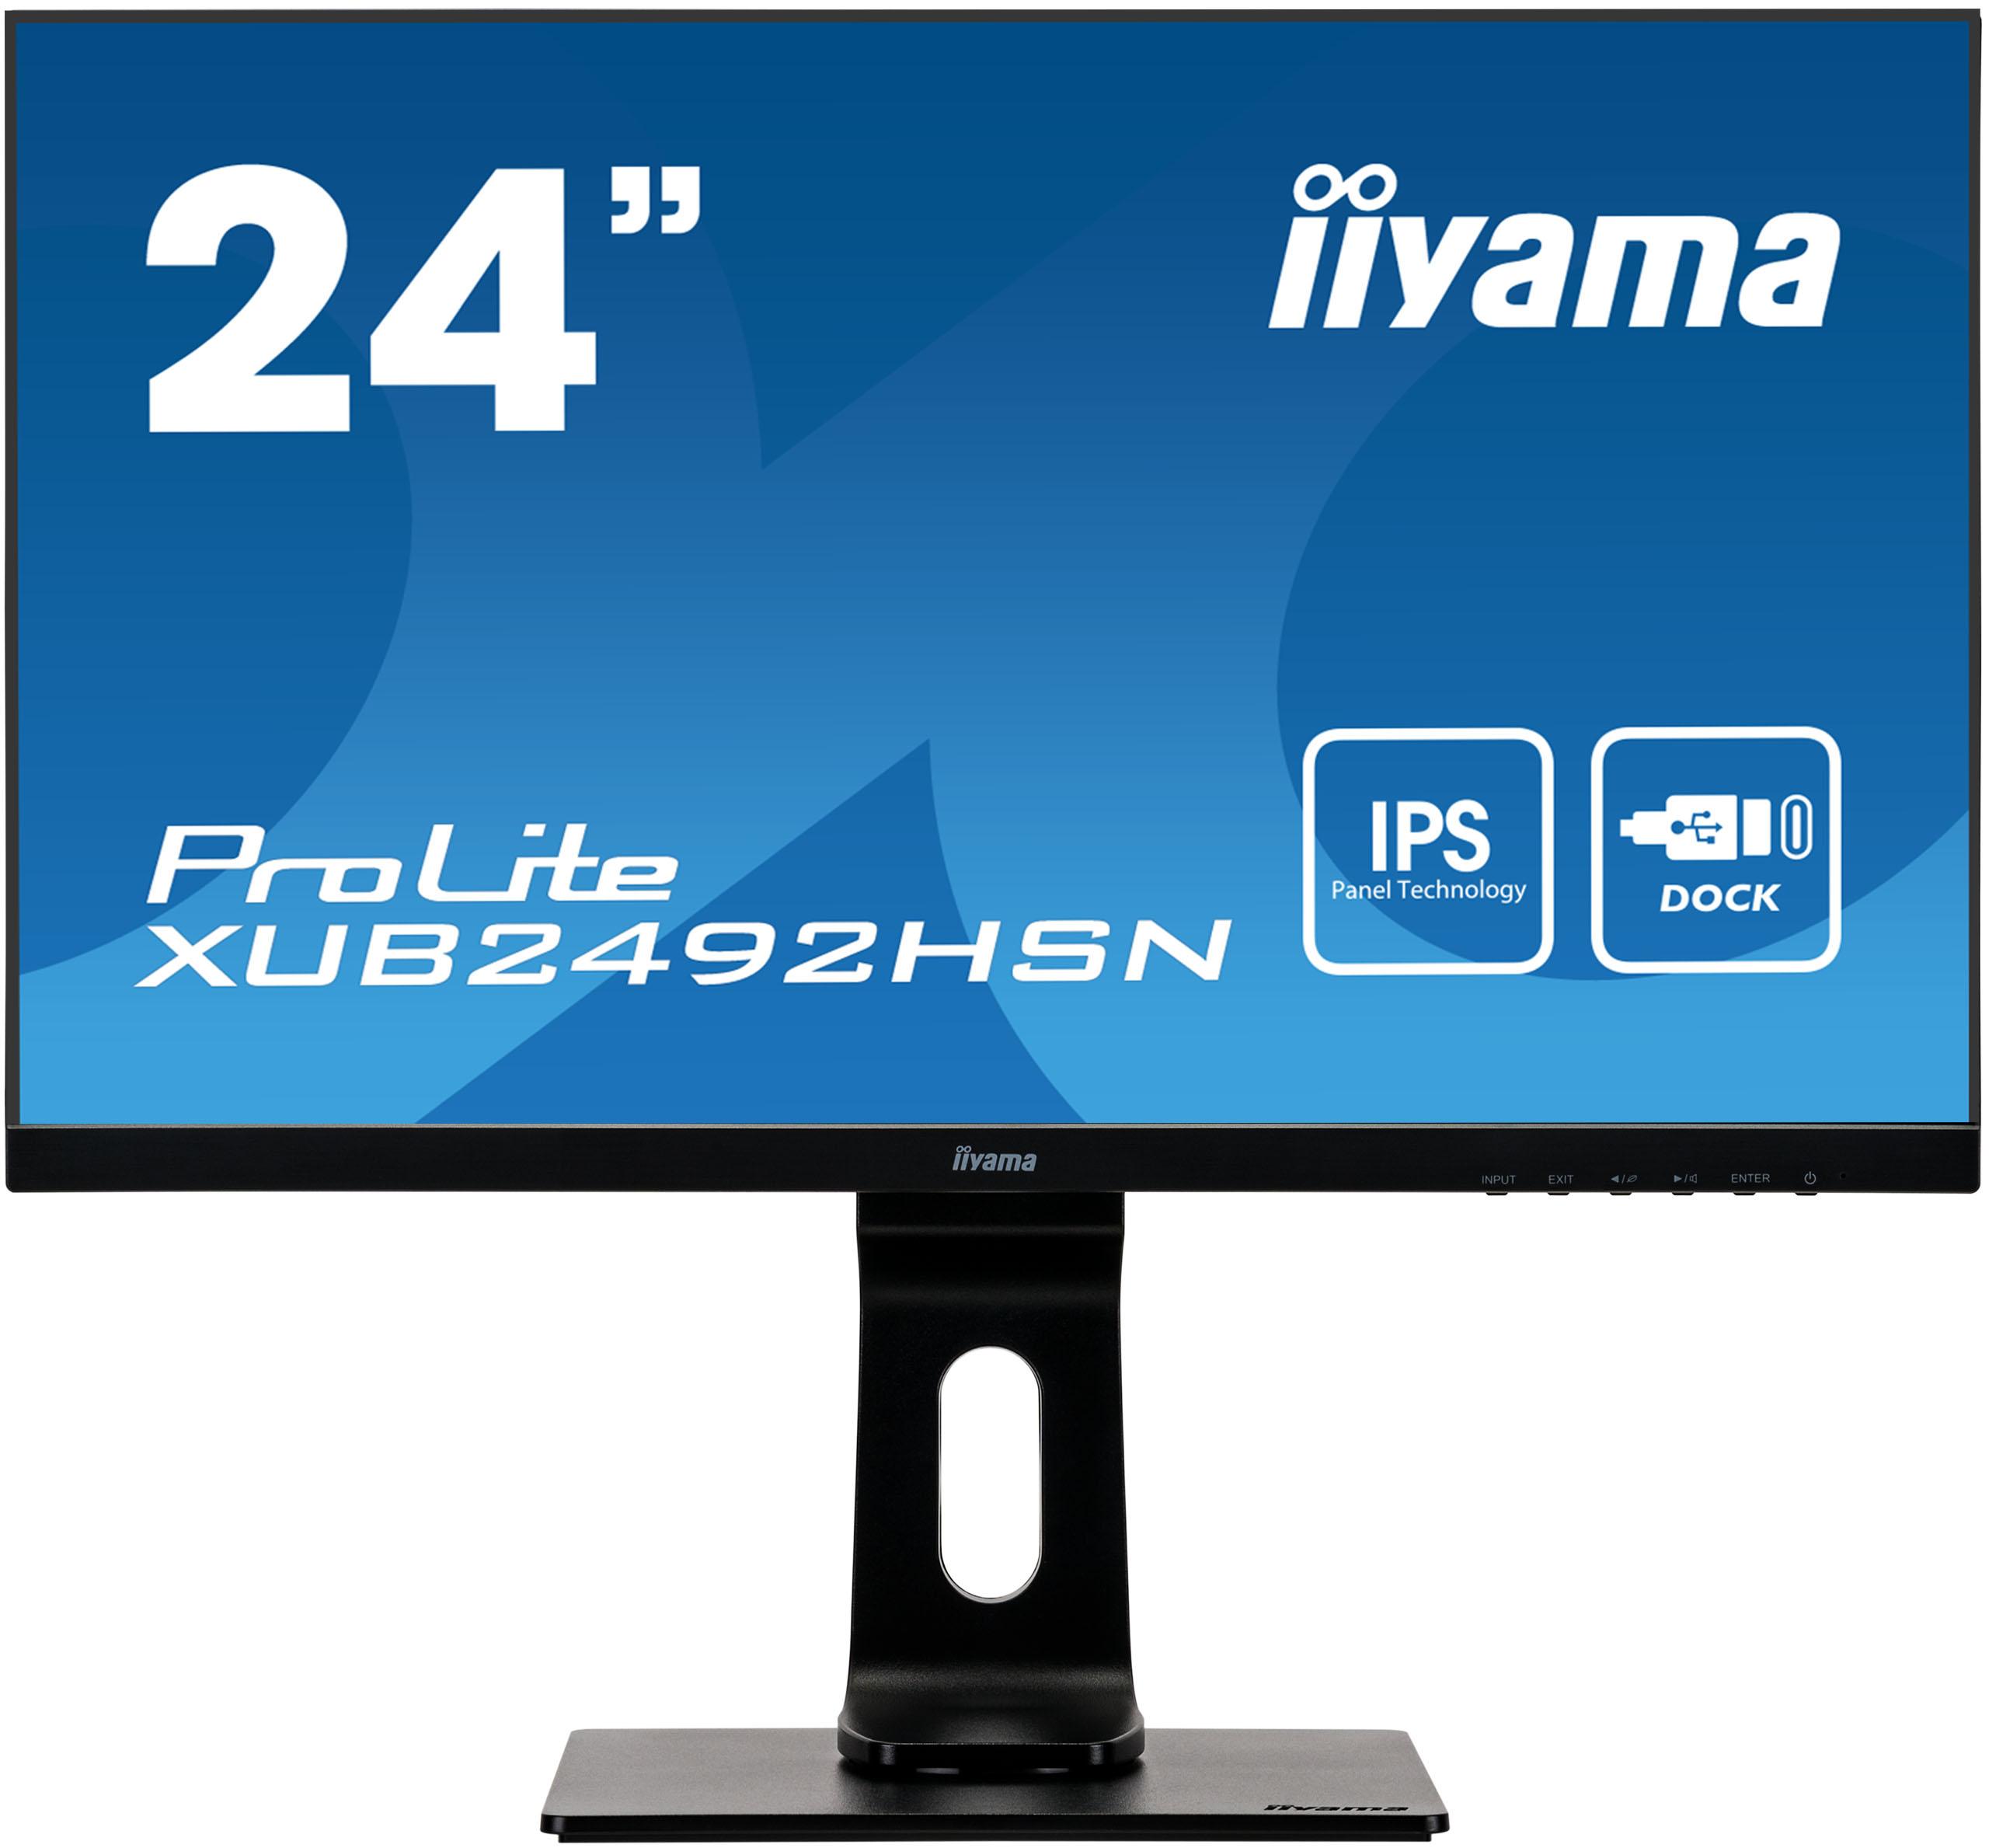 24'' iiyama XUB2492HSN-B1: IPS, FullHD@75Hz, 250cd/m2, 4ms, HDMI, DP, USB-C, height, pivot, černý - XUB2492HSN-B1